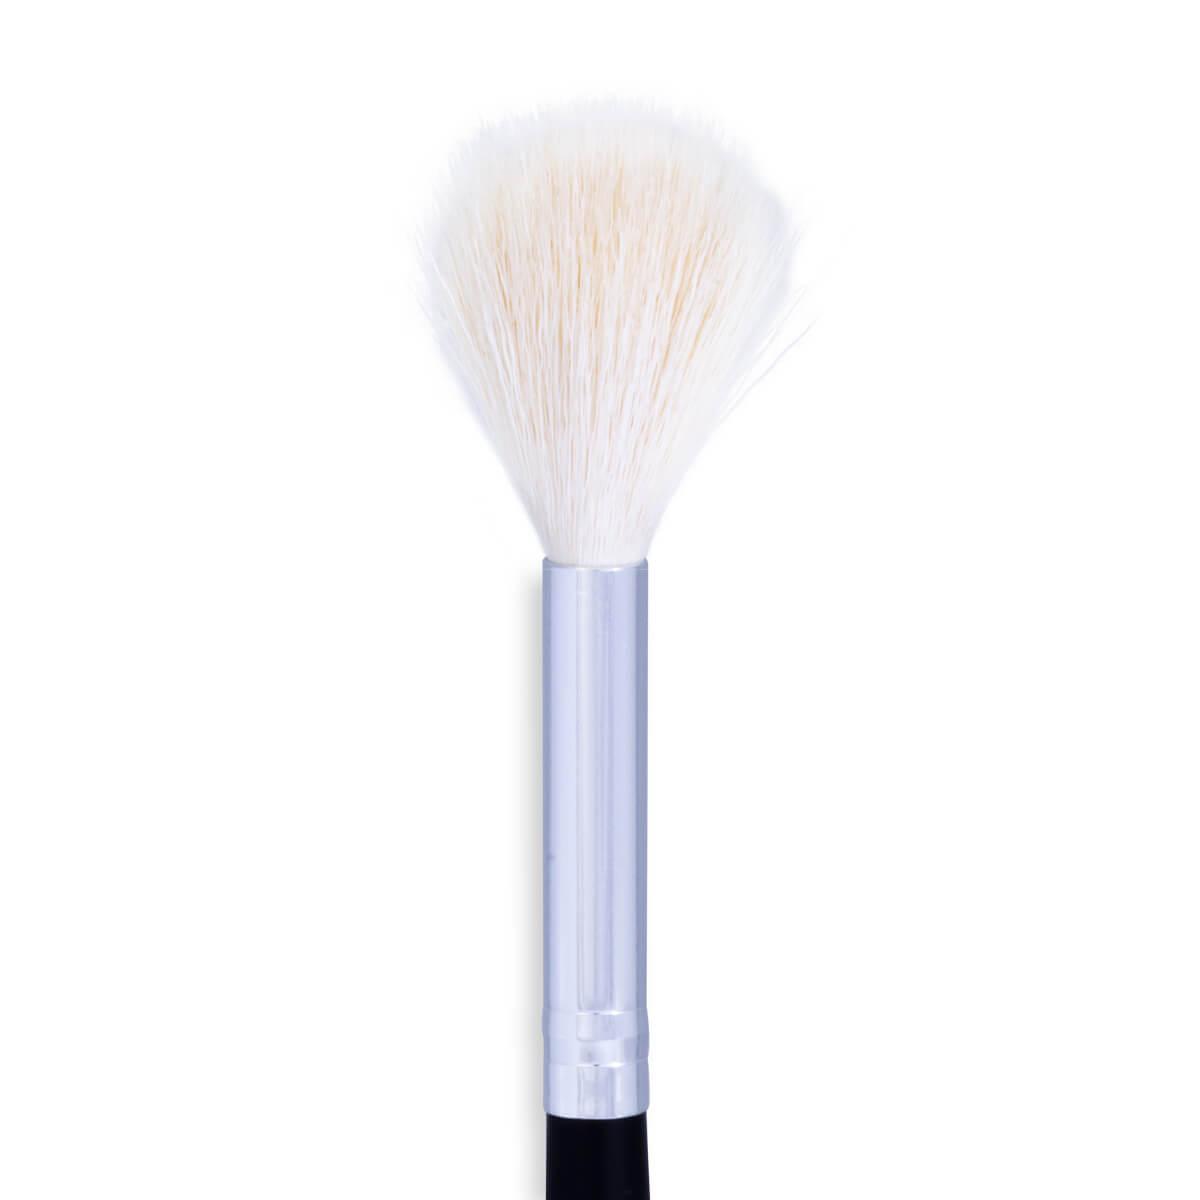 S32 - Pincel Médio Para Iluminador Sffumato Beauty